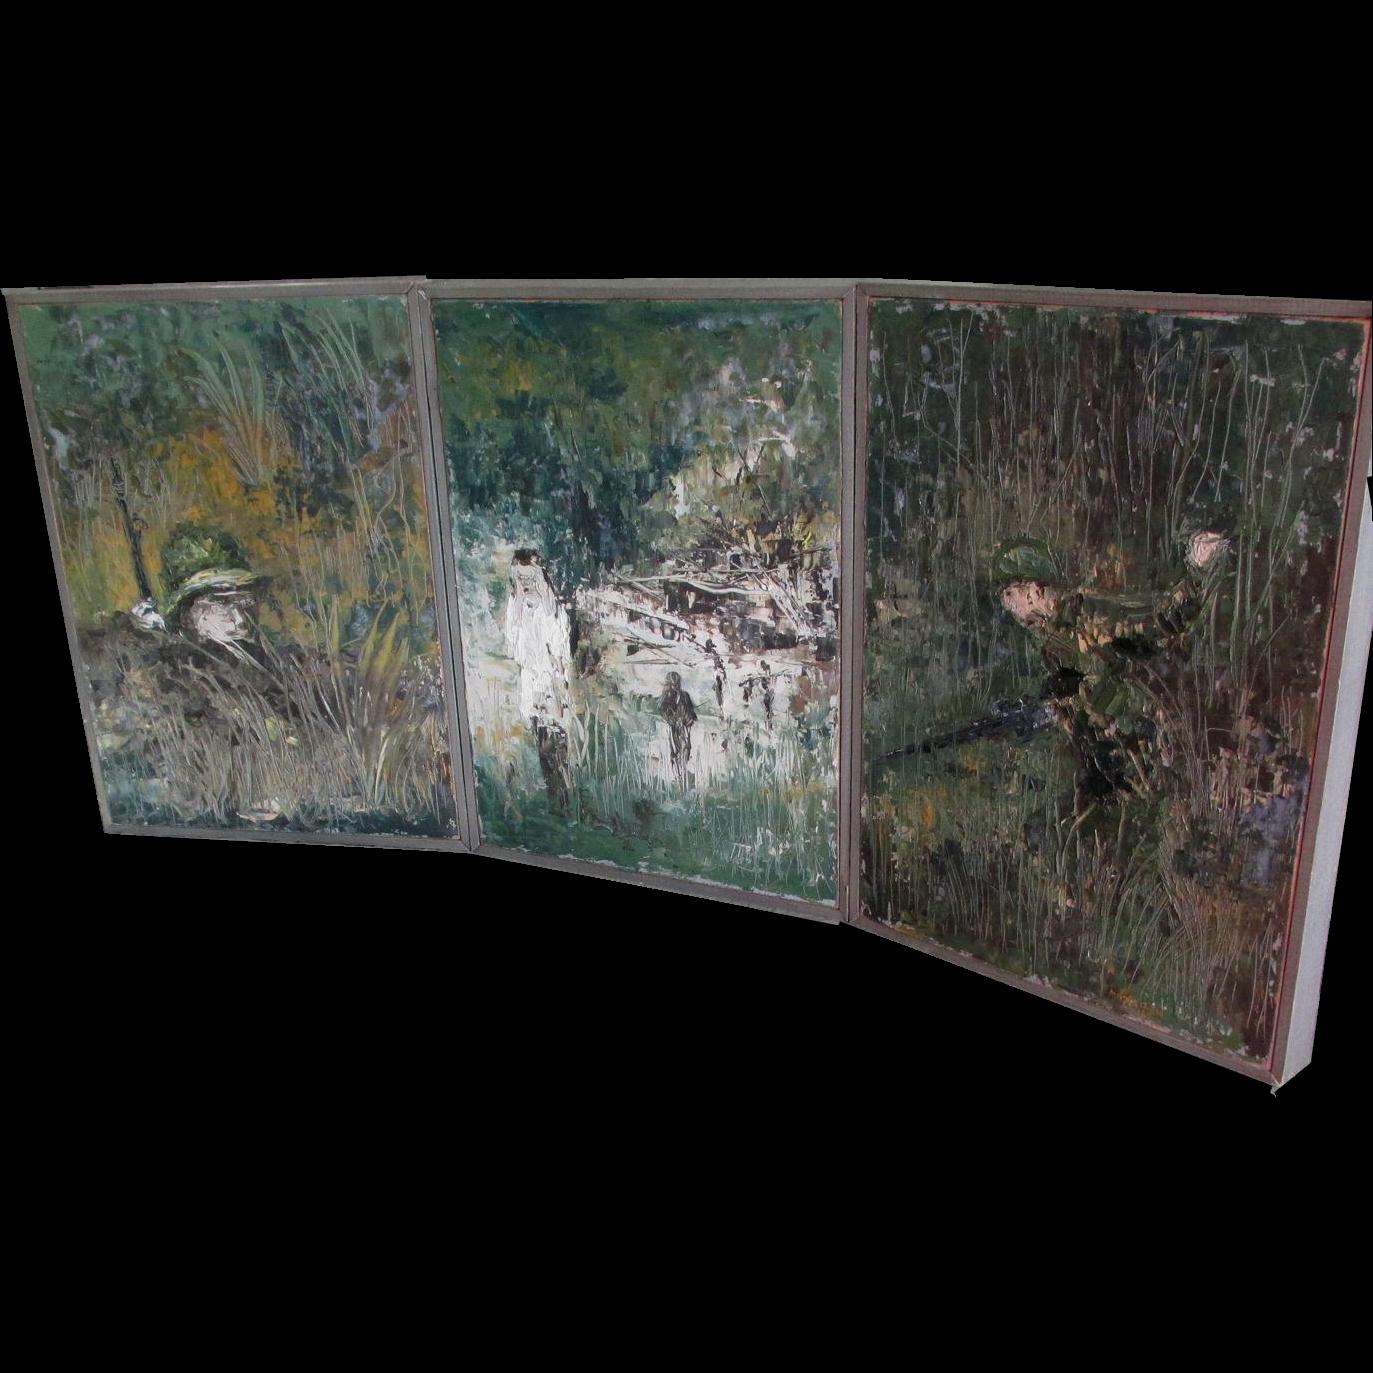 c1967 Impressionist Triptych Oil Painting, Vietnam War, Signed Vasilew